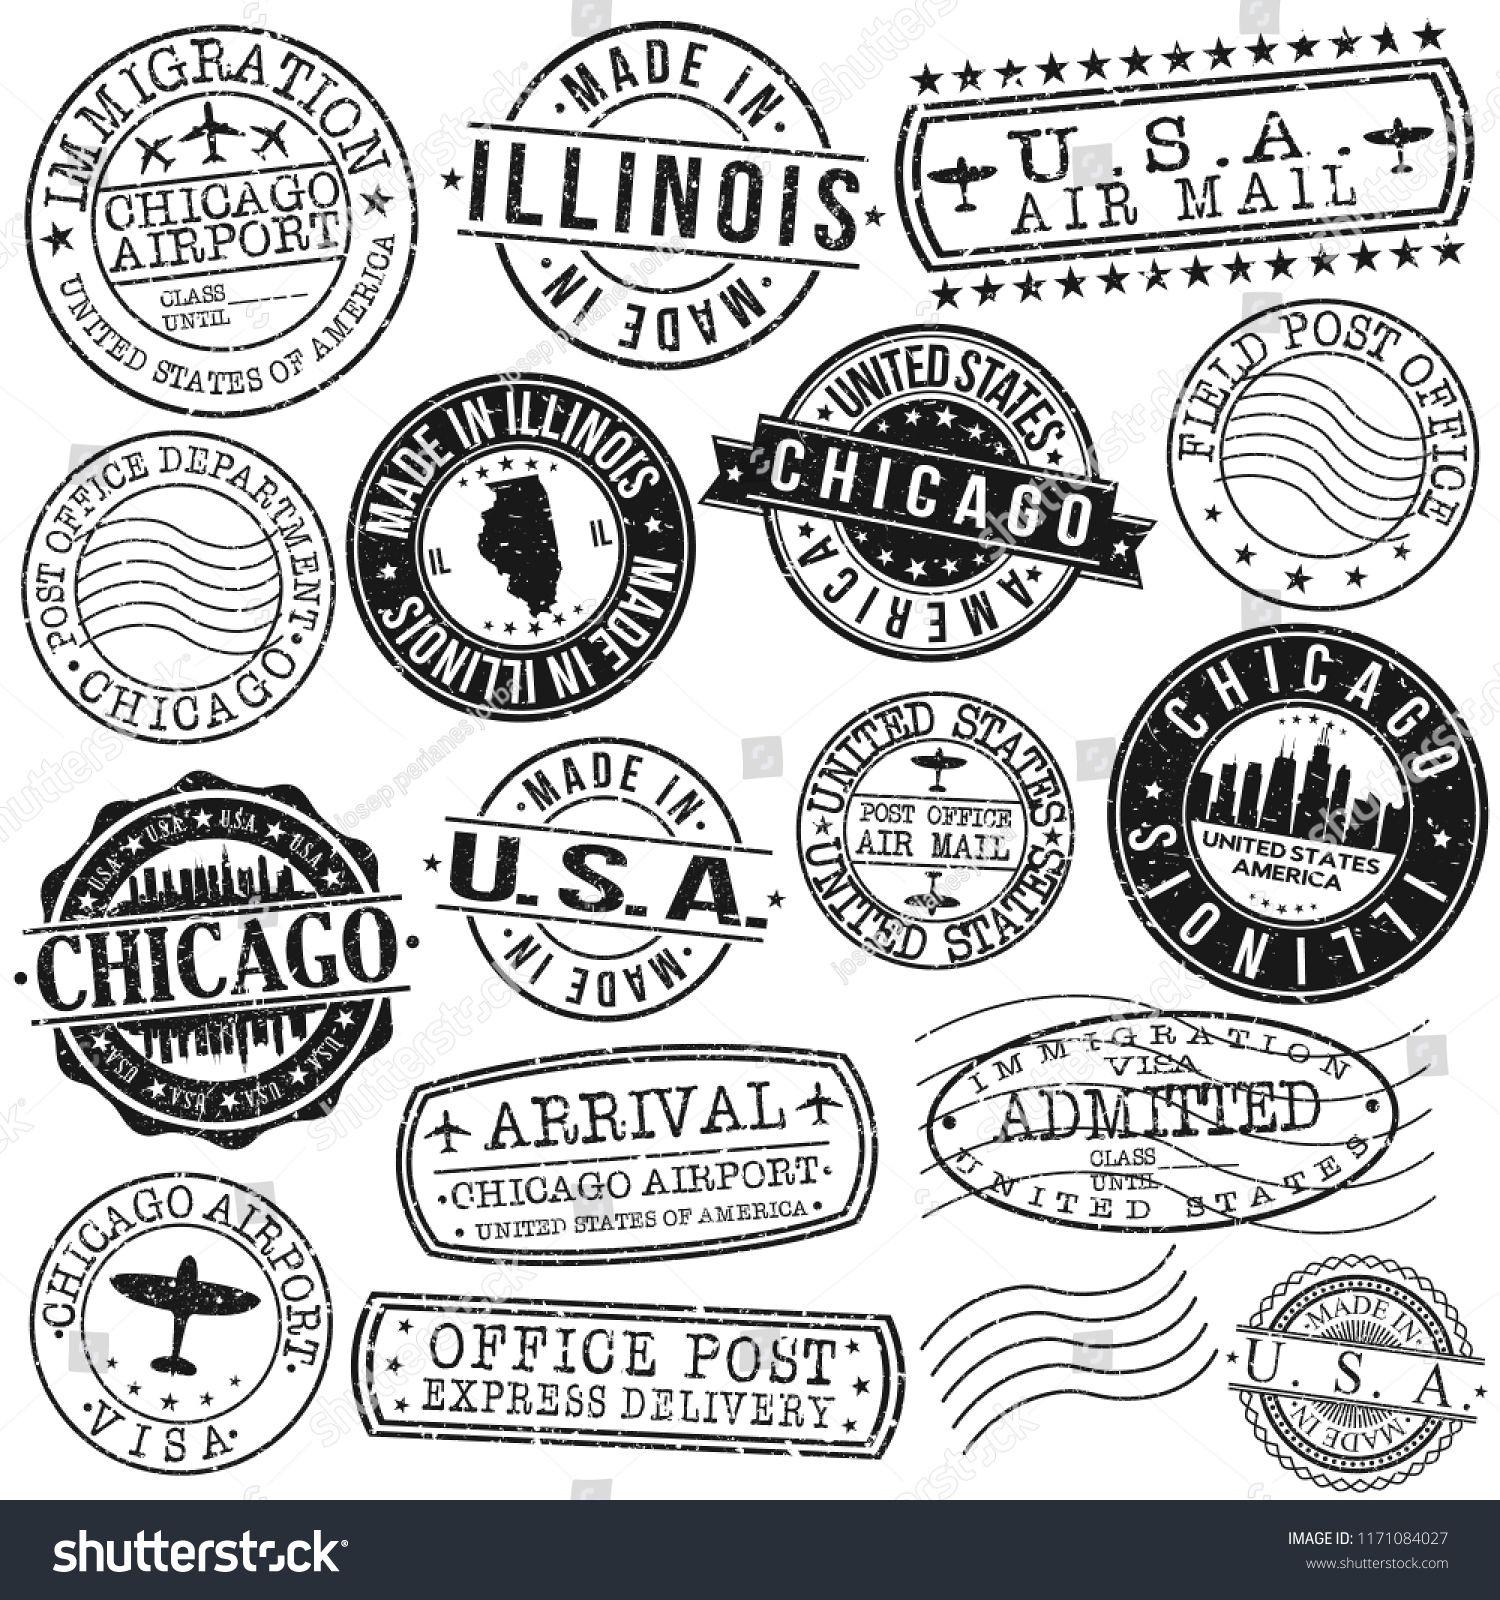 Chicago illinois usa stamp vector art postal passport